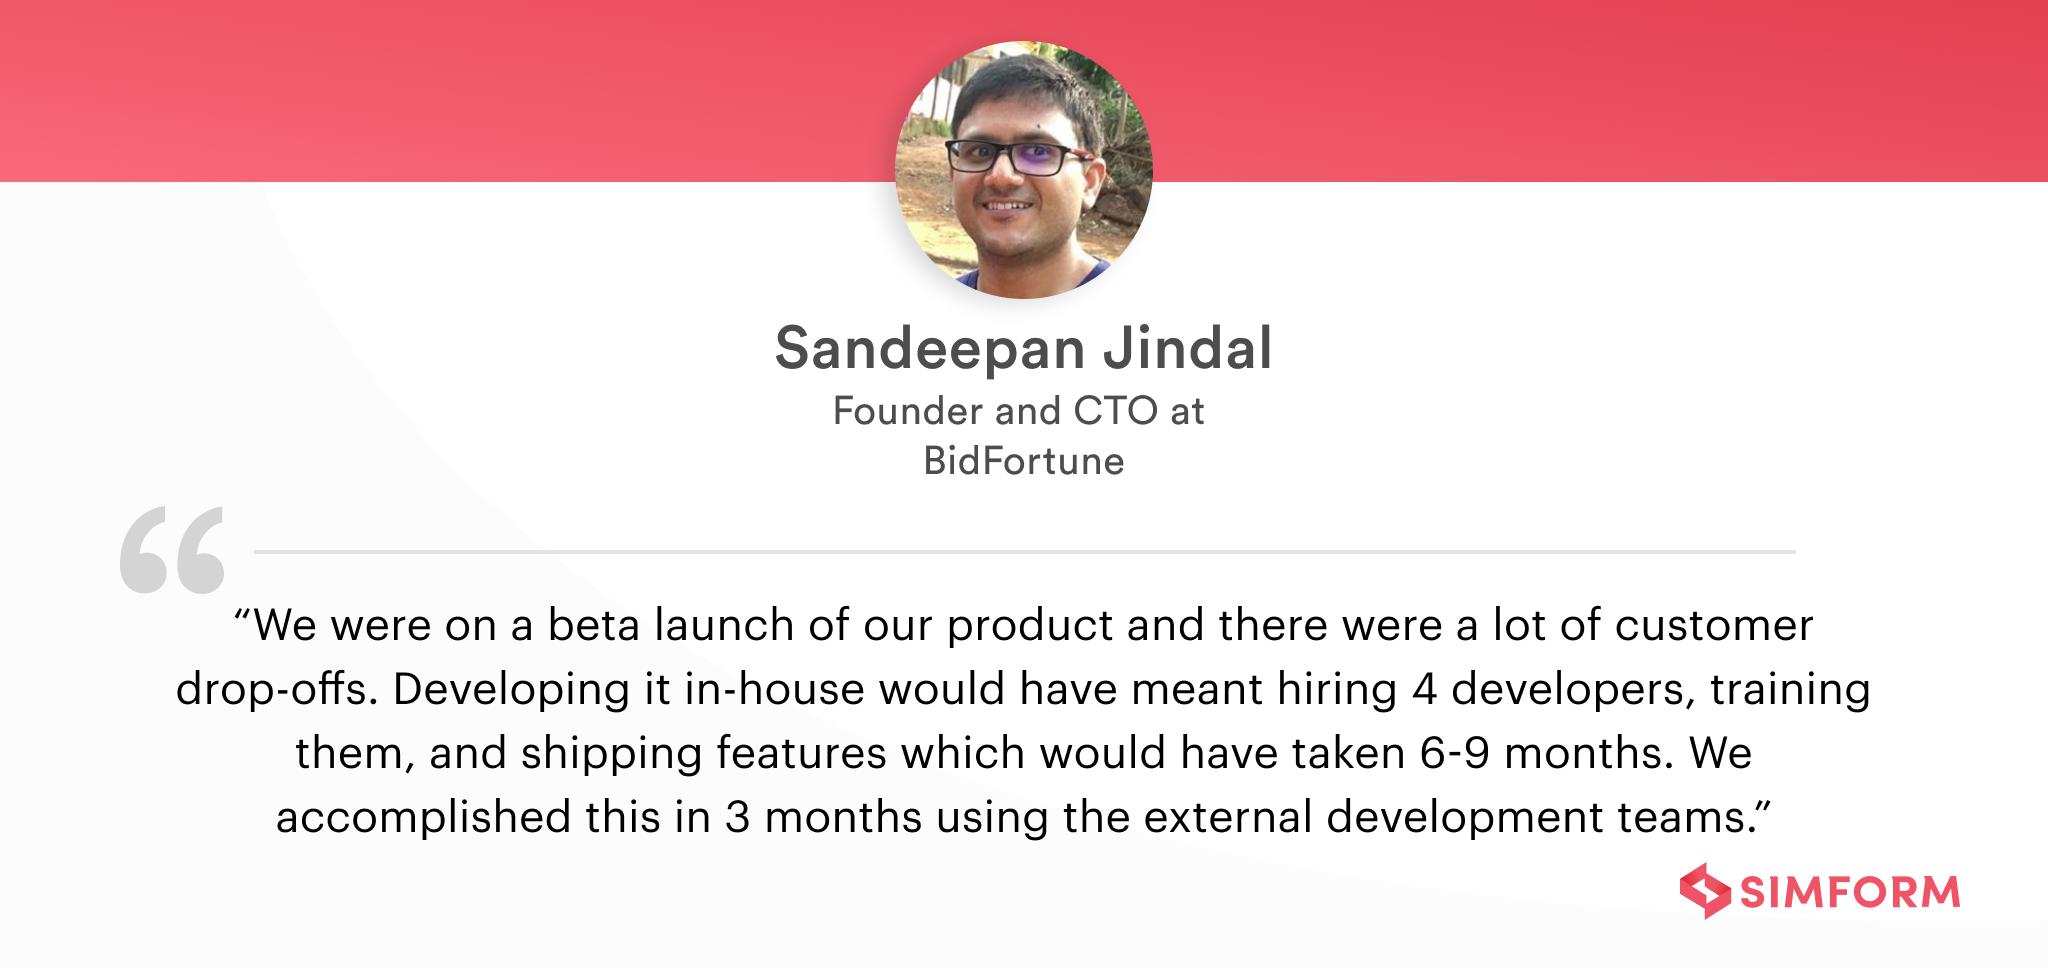 Sandeepan Jindal